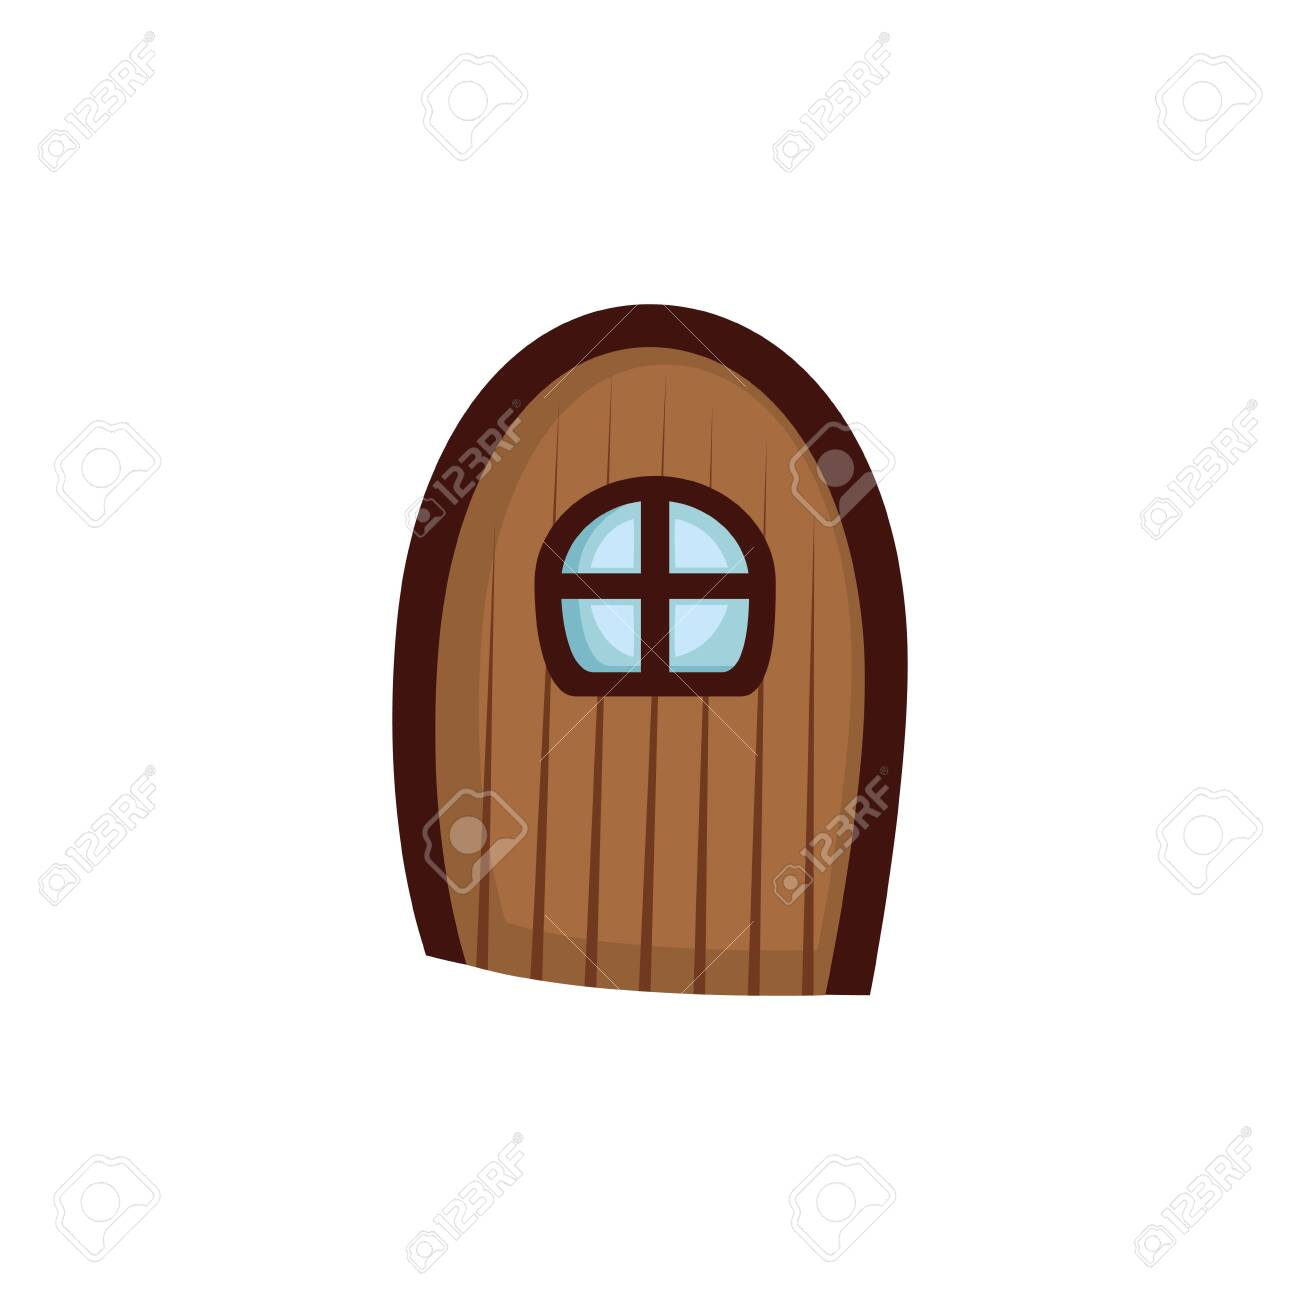 wooden door with window fairytale isolated icon vector illustration design - 133906964